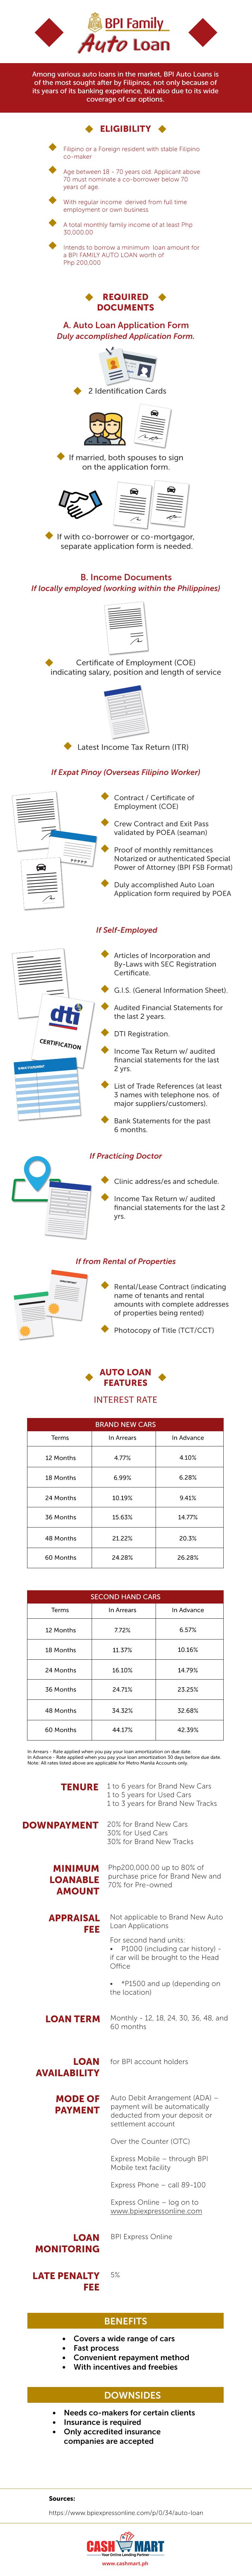 bpi-auto-loan-1